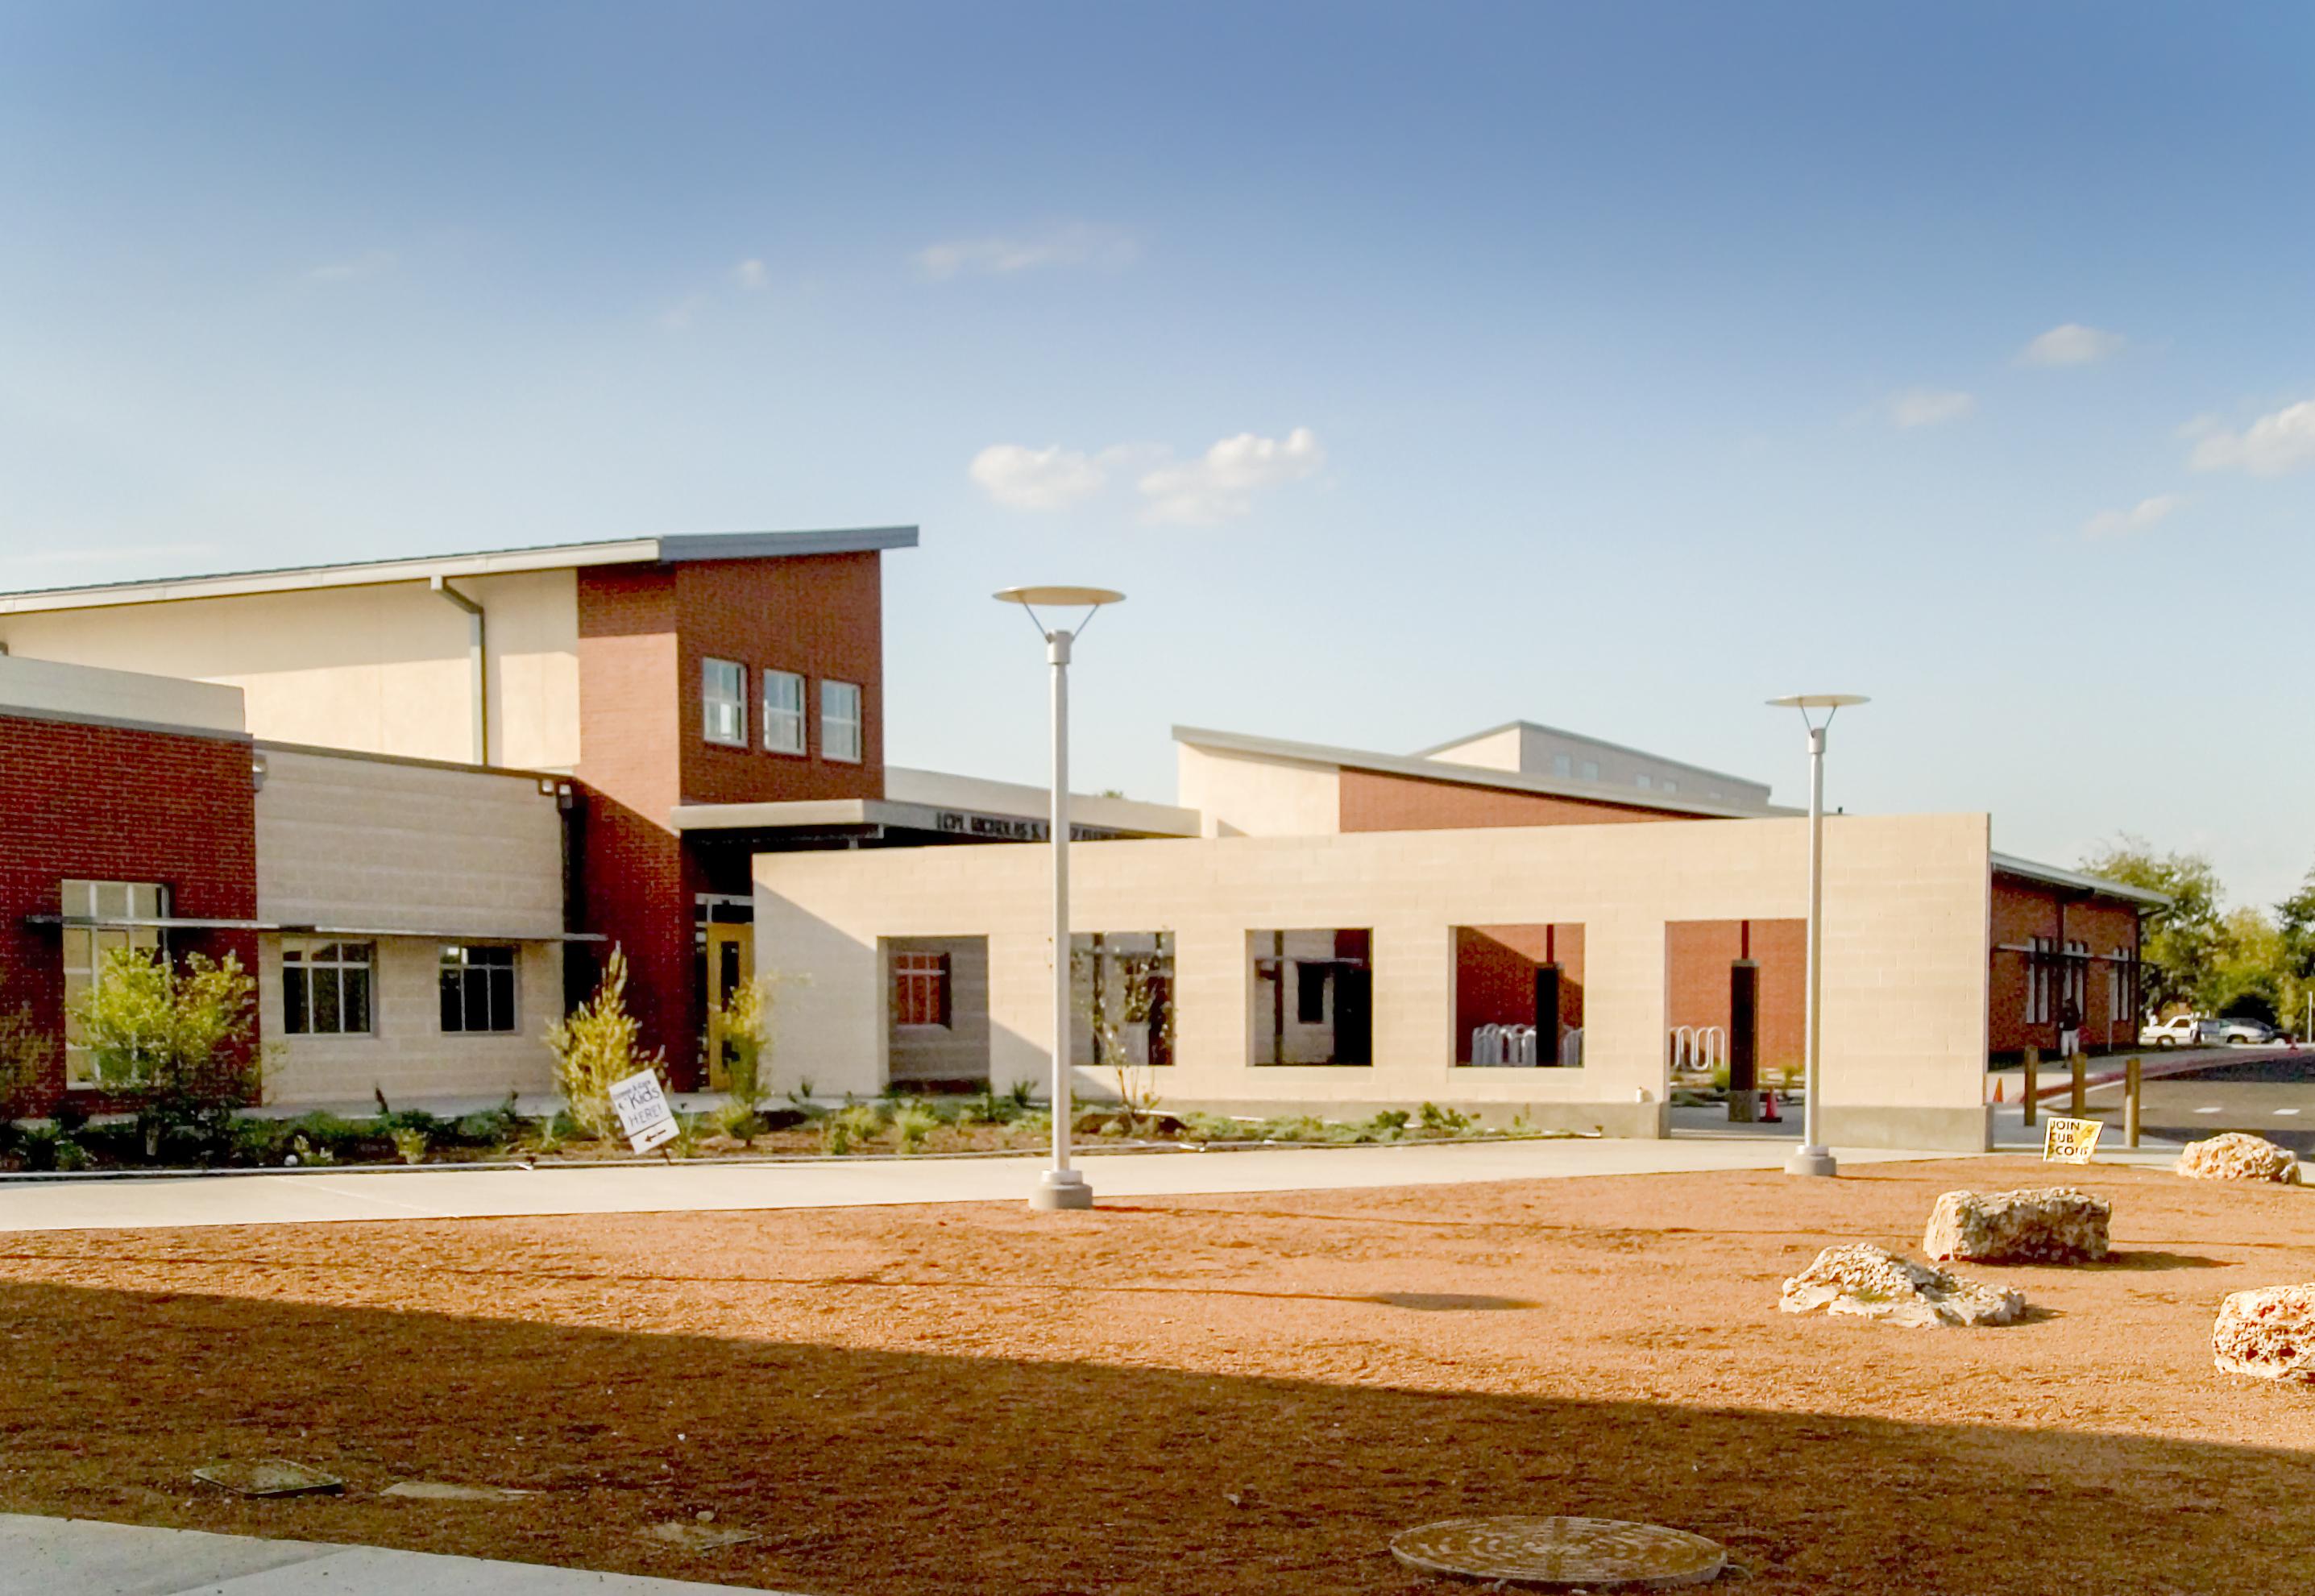 AISD: PEREZ ELEMENTARY SCHOOL